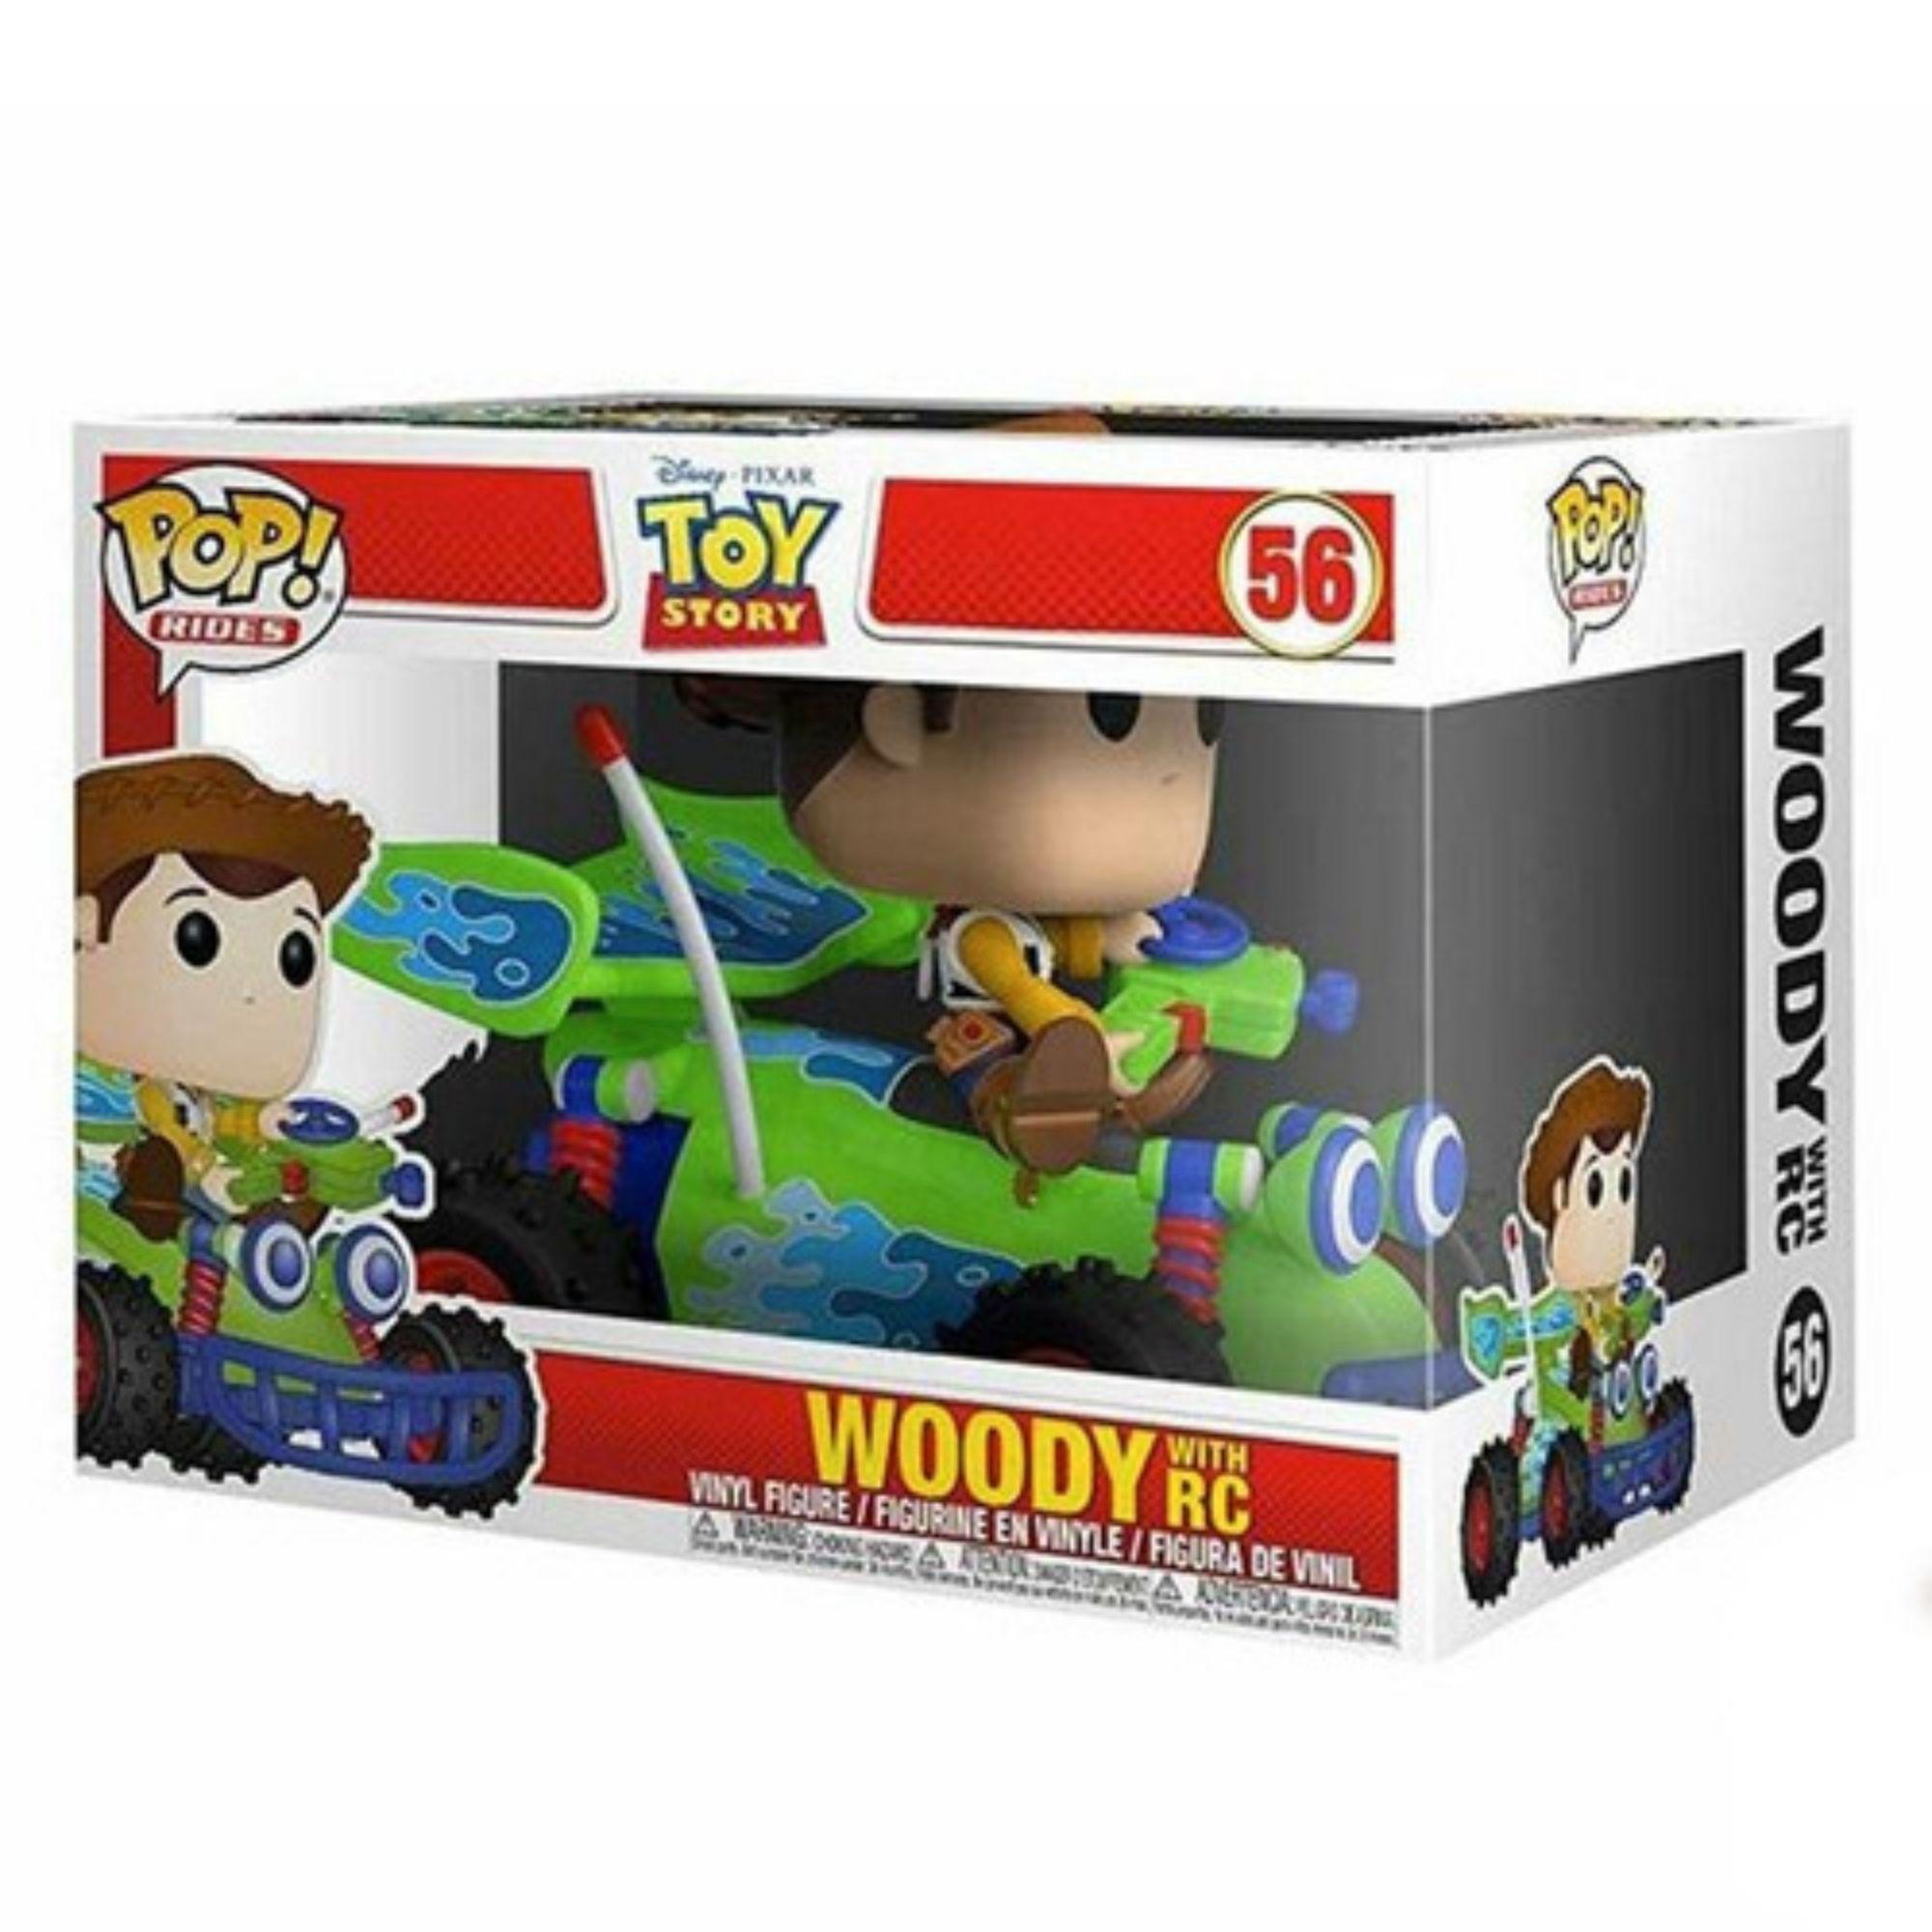 Funko Pop Rides Disney Toy Story Woody e RC #56  - Game Land Brinquedos